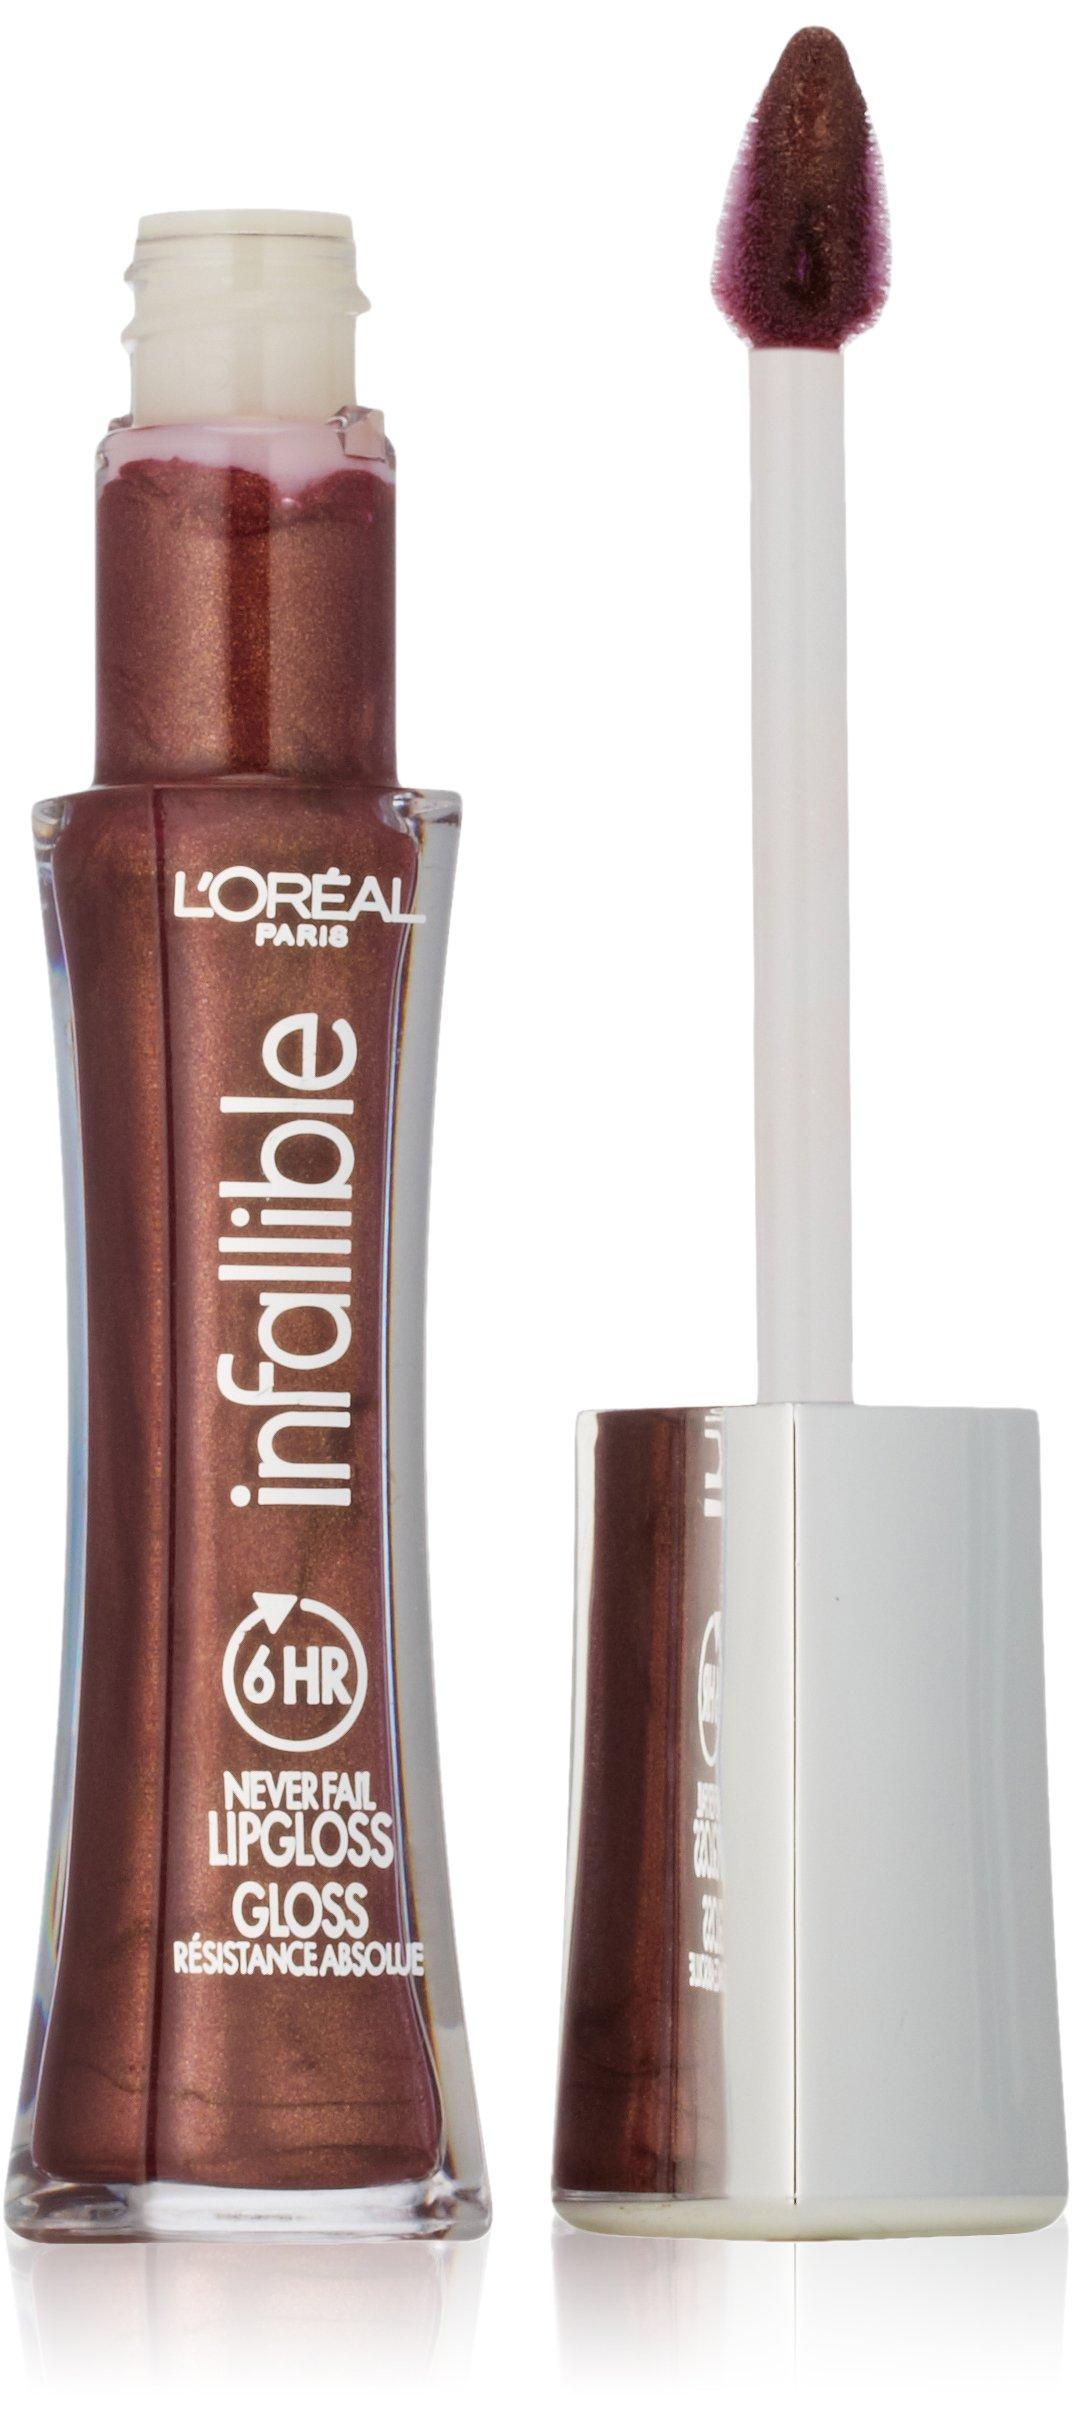 LOreal PARIS Infallible Never Fail Lip Gloss 815 Barely